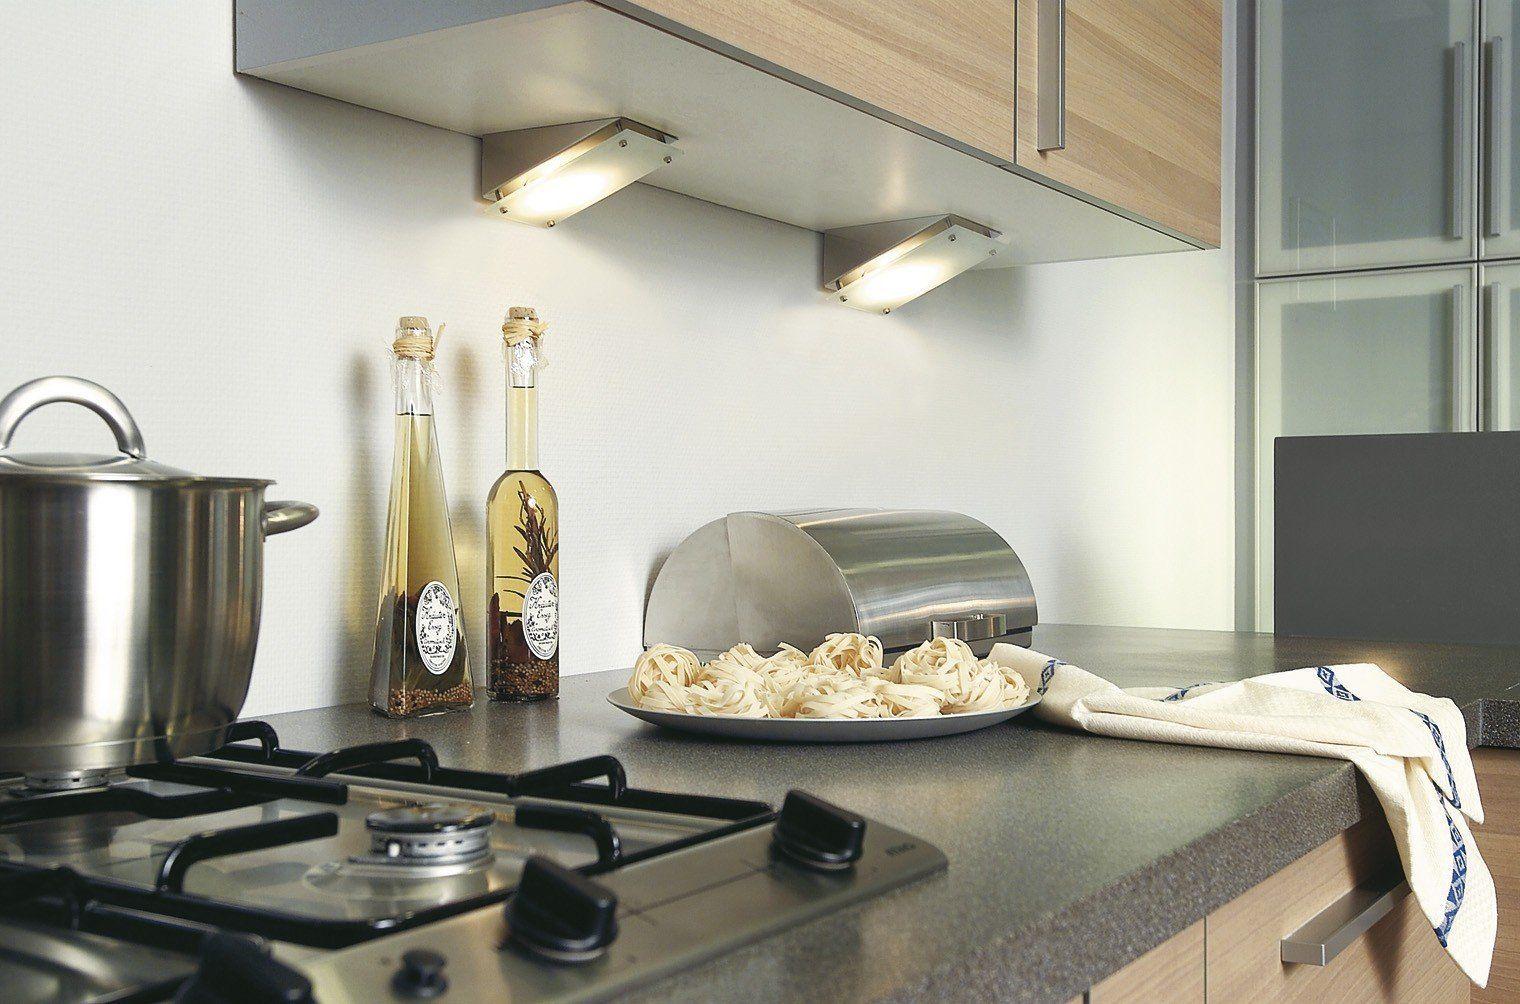 лампы на рабочей зоной на кухне